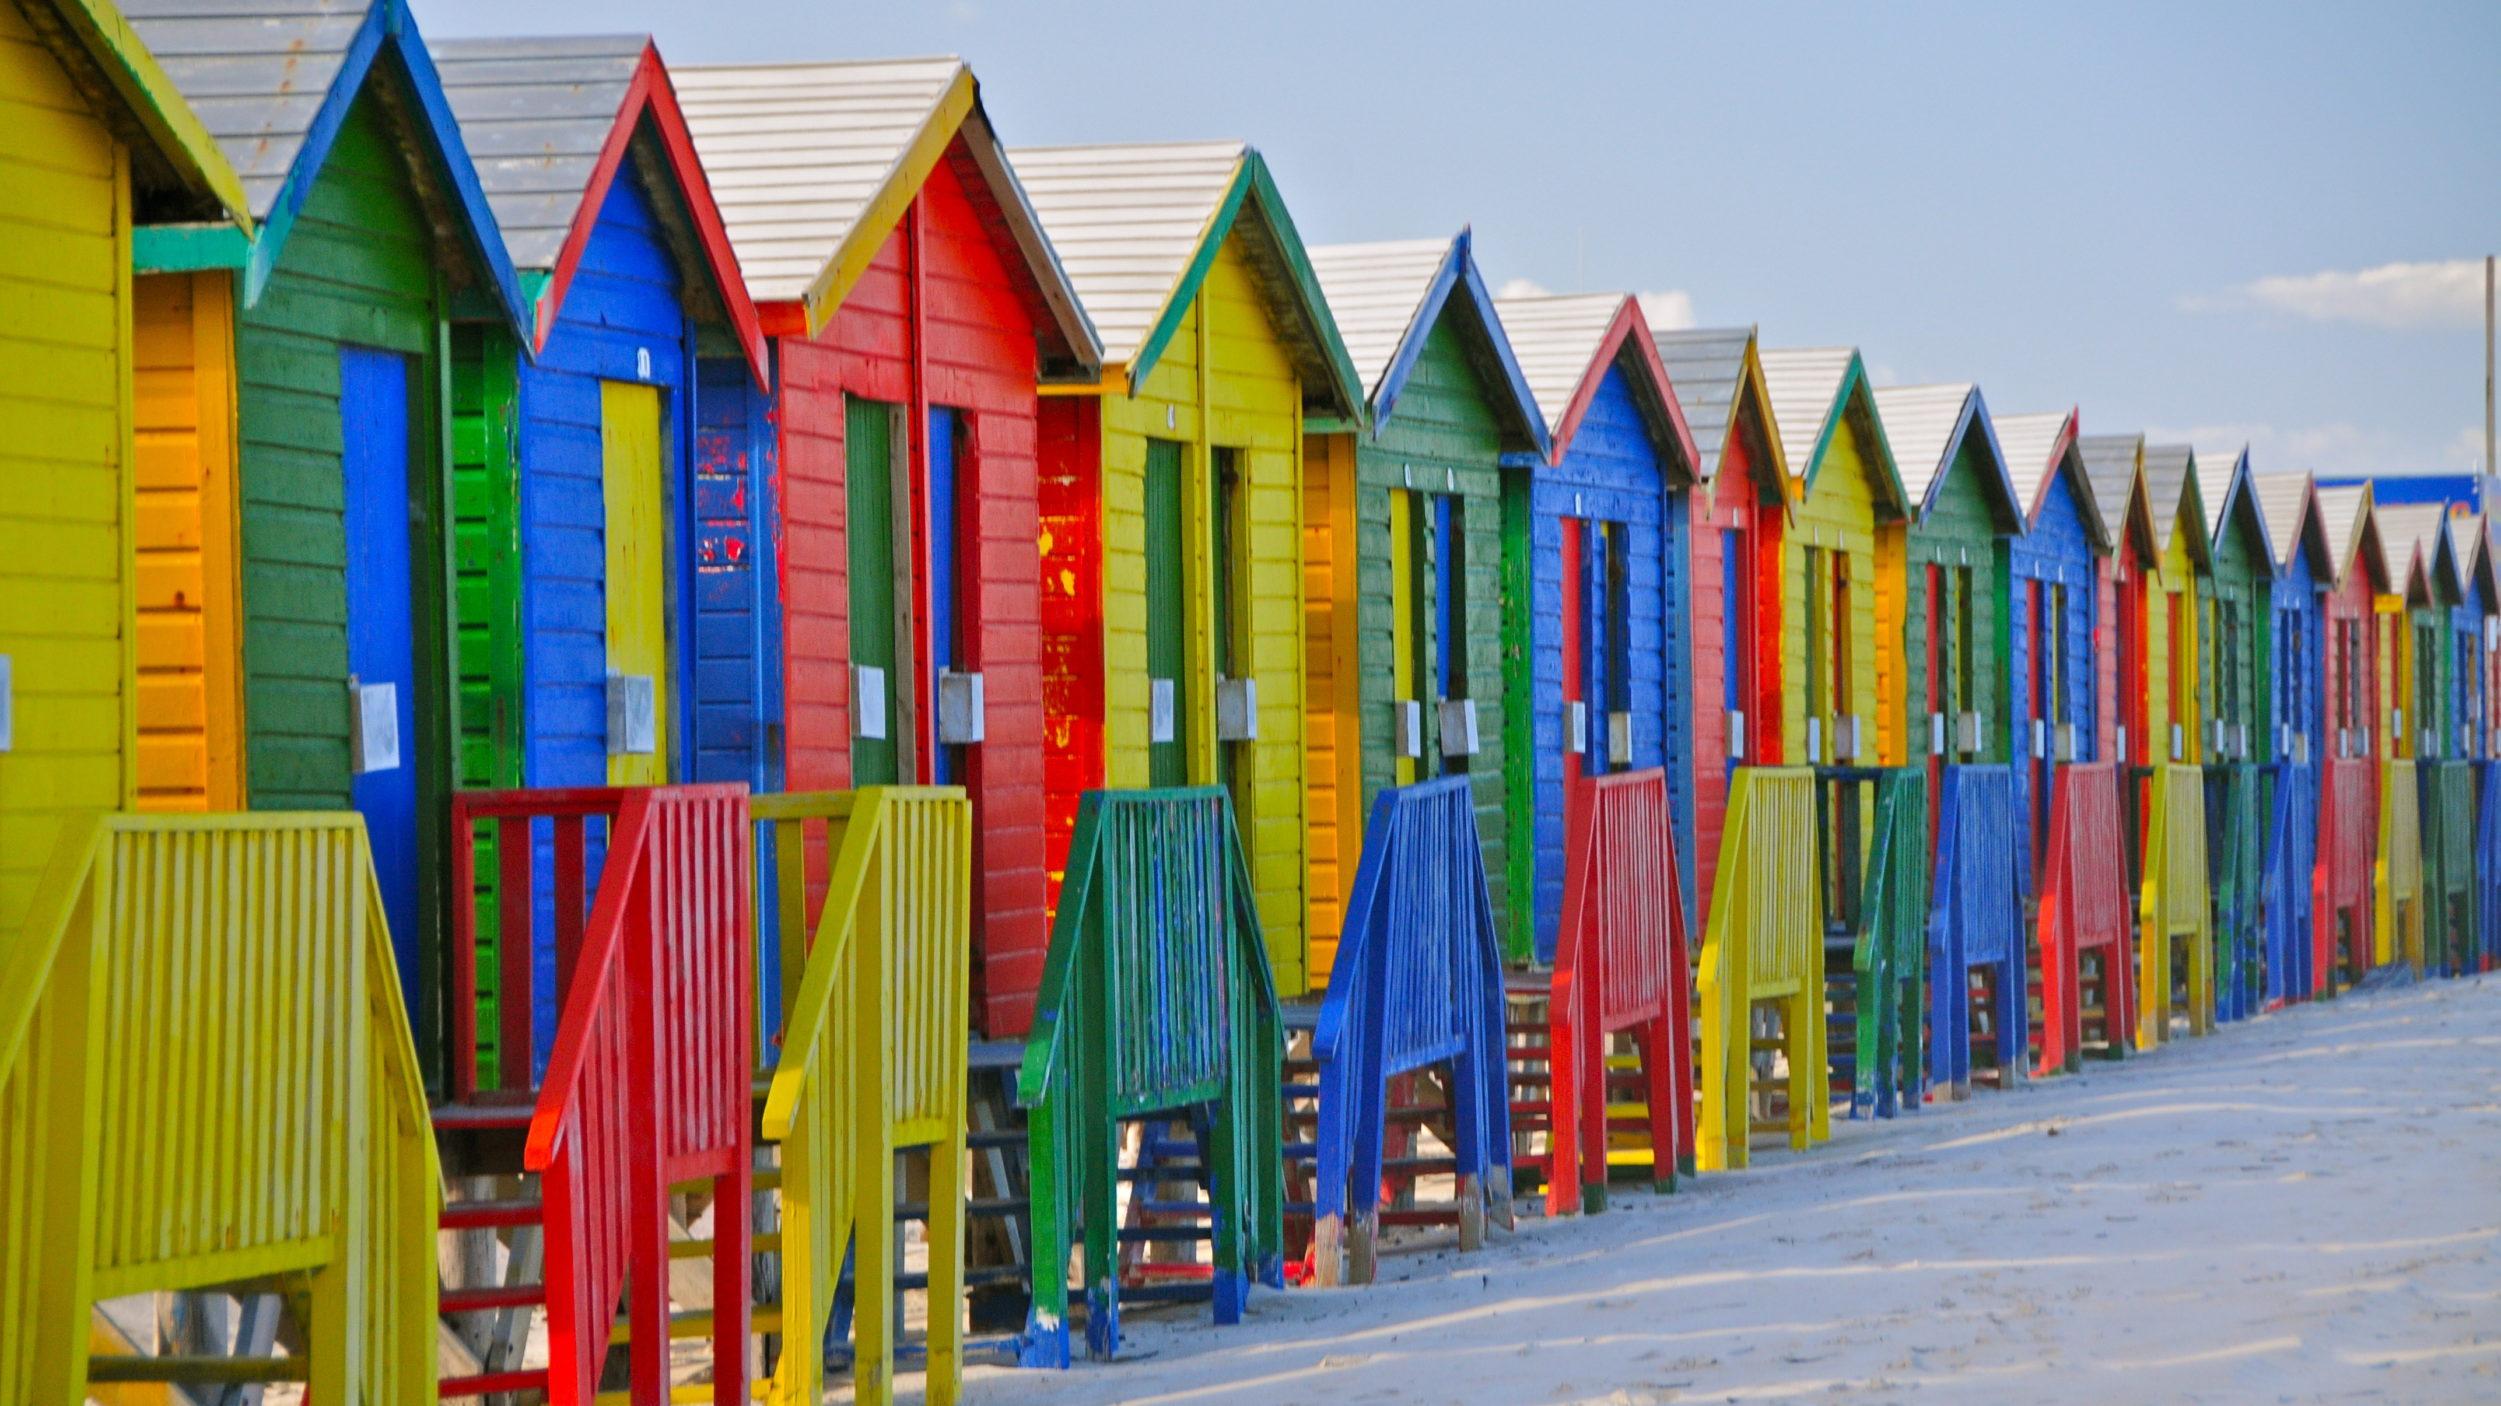 South Africa [shutterstock]